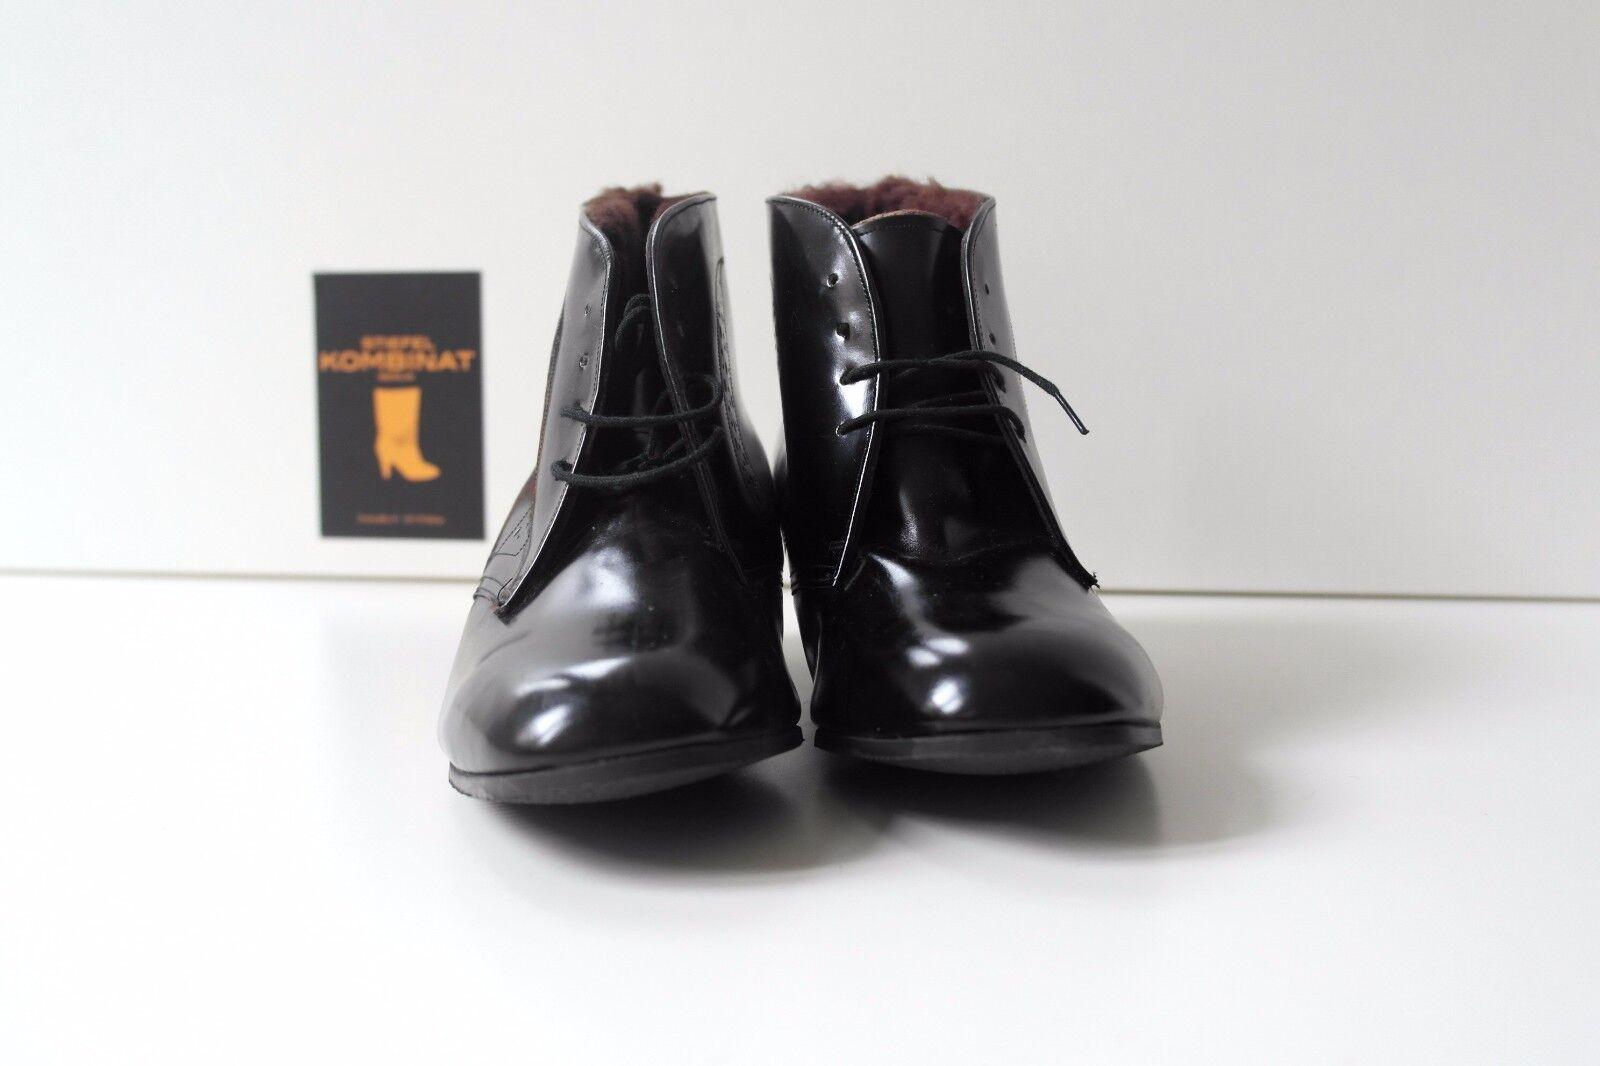 Wolko Carmen True Vintage Femmes Chaussures Basses Hiver Chaussures Chaussures Chaussures Chaussure Lacée nos UK 5 b3b60e